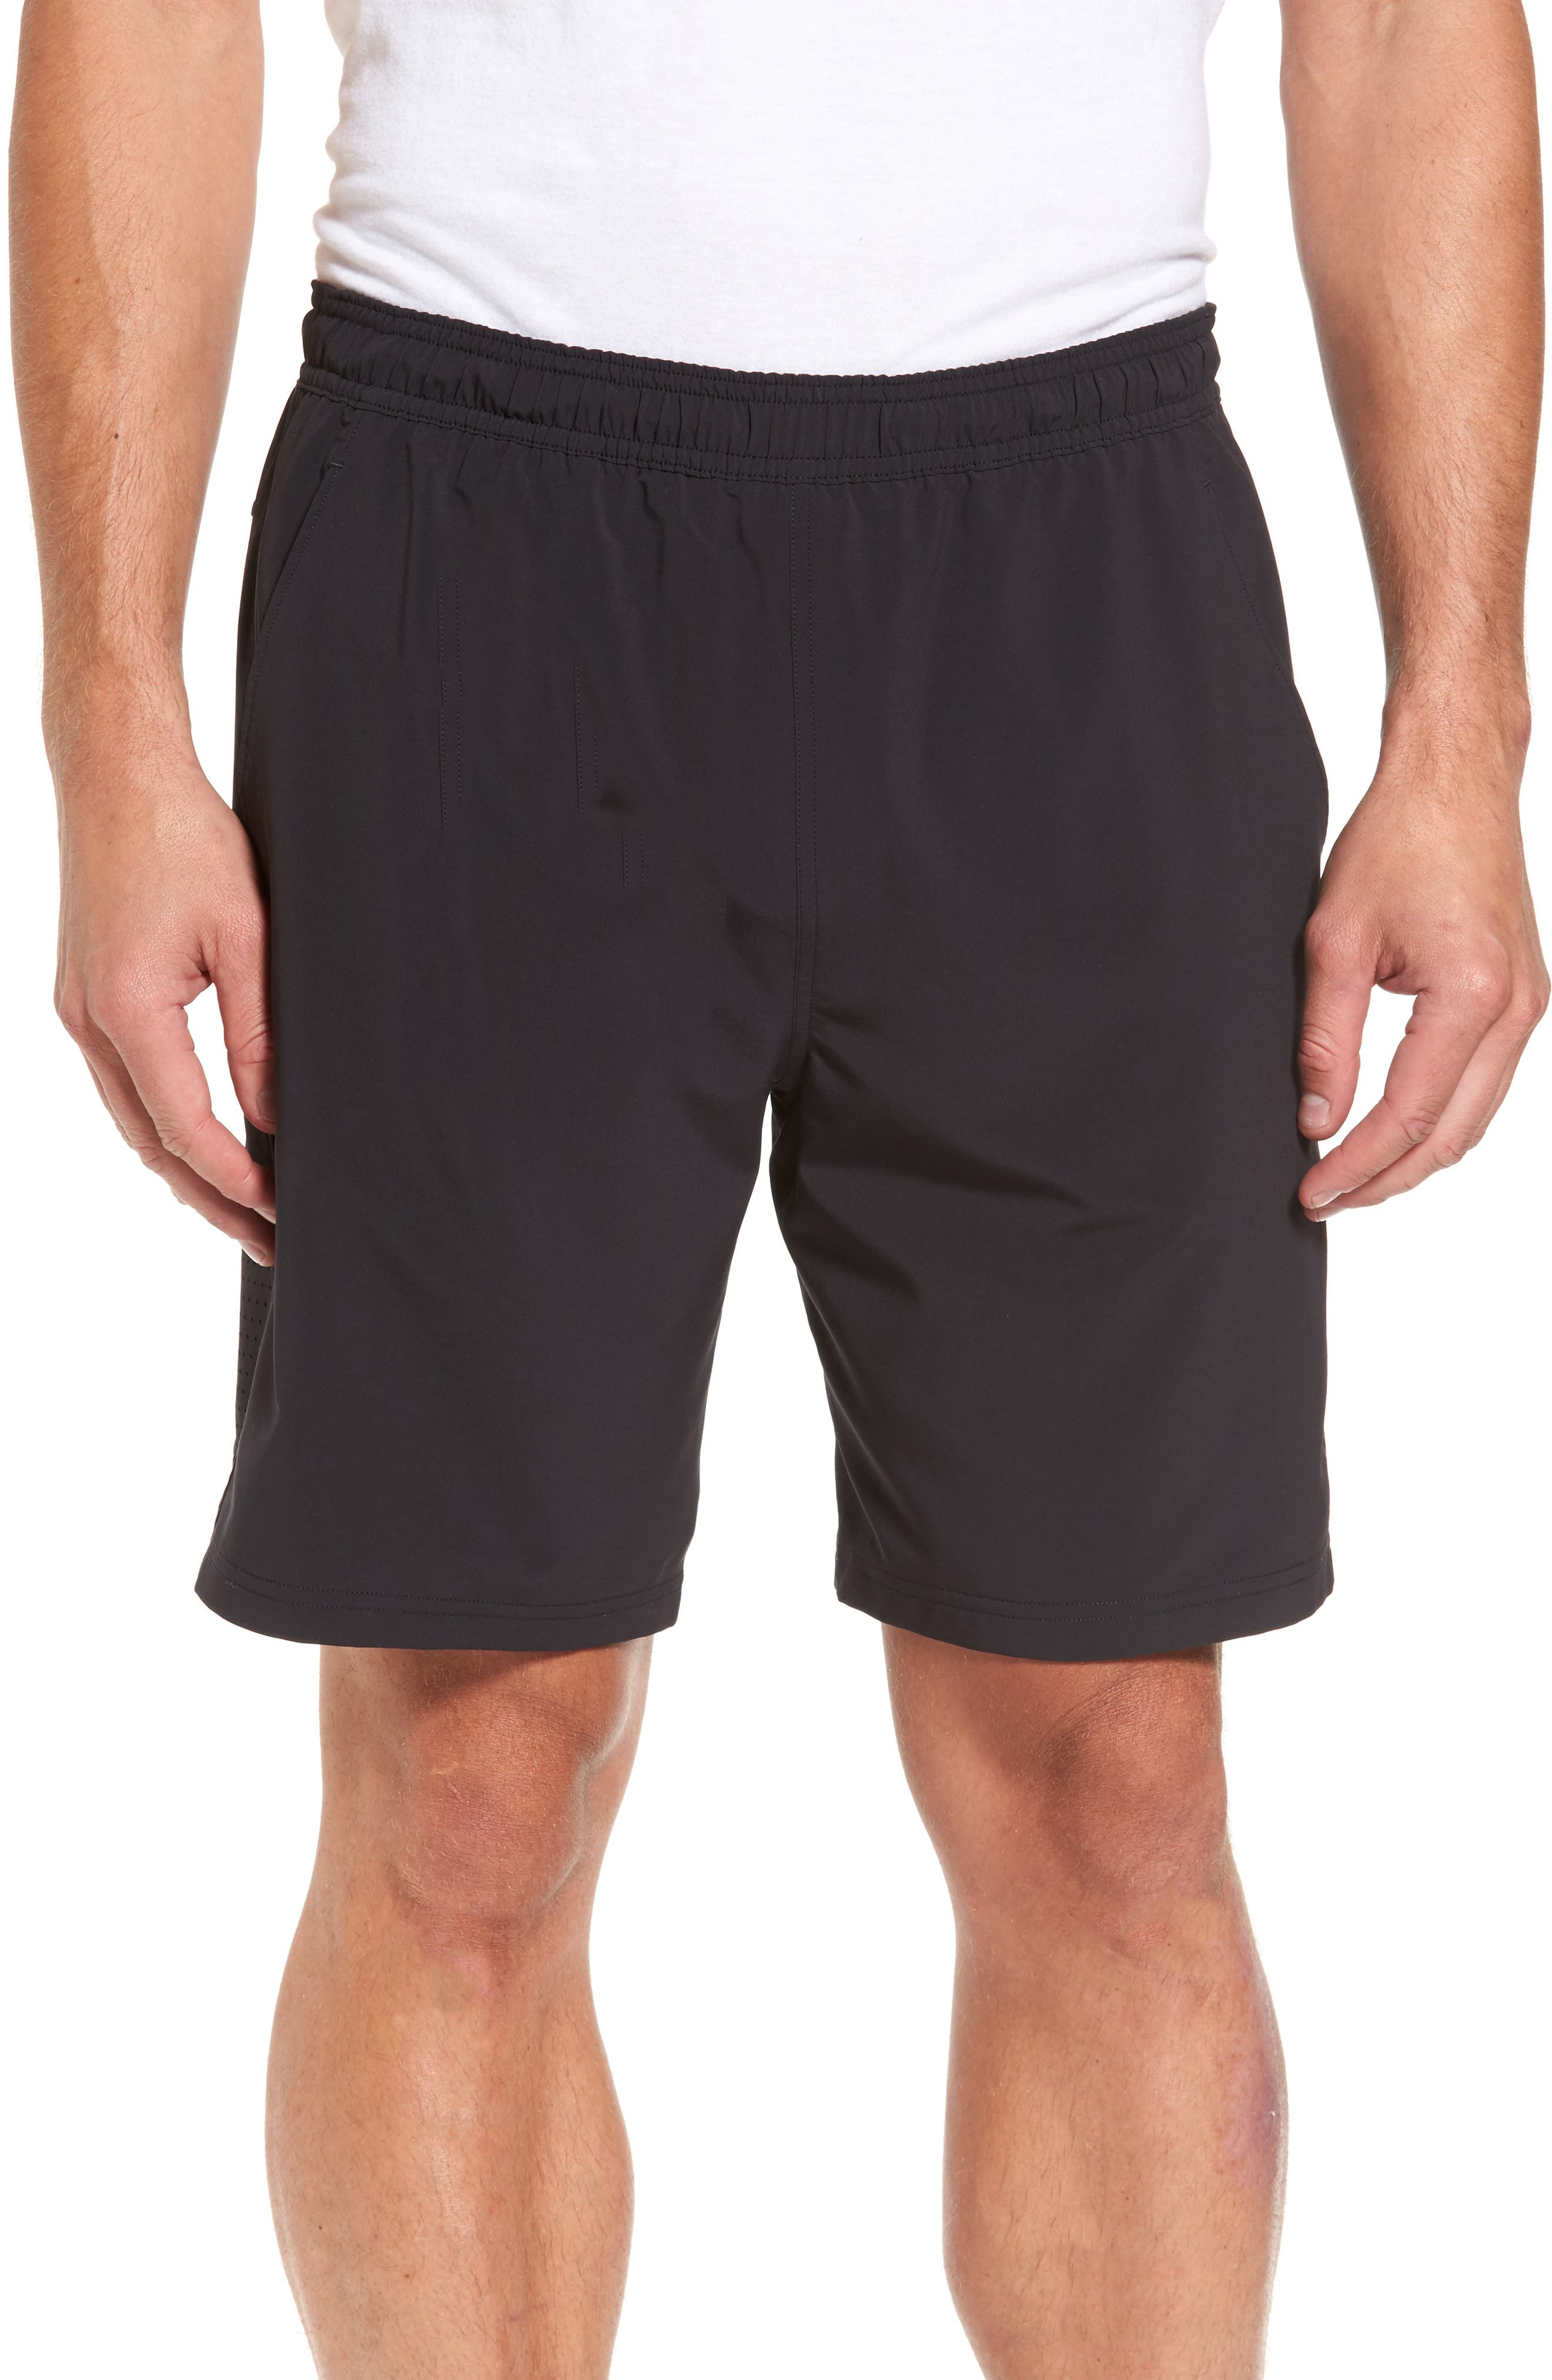 Graphite Core Athletic Shorts,                             Main thumbnail 1, color,                             BLACK